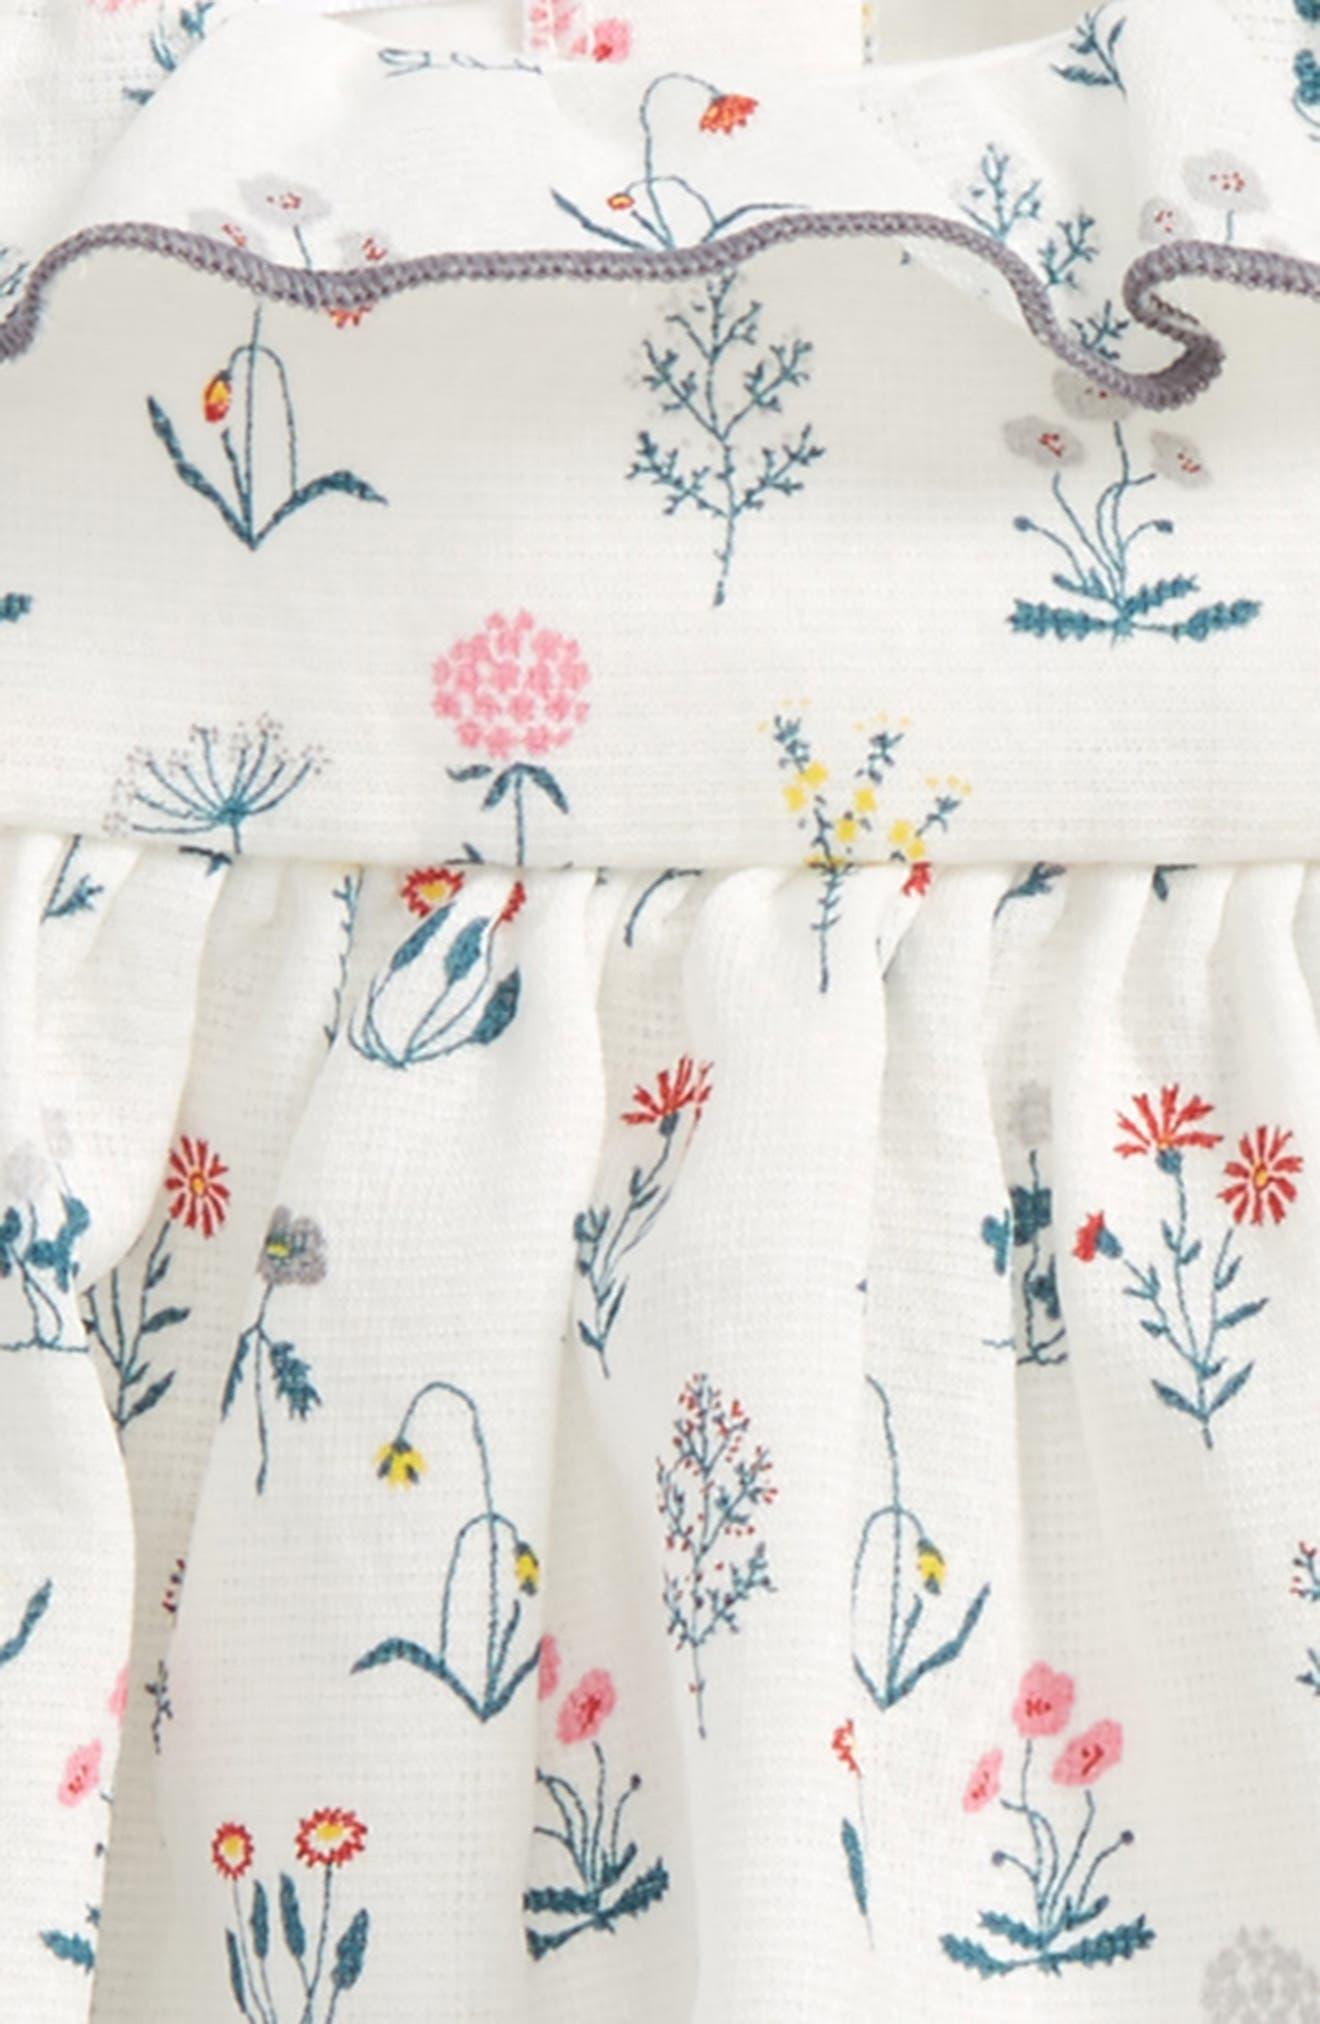 Floral Print Dress & Leggings Set,                             Alternate thumbnail 2, color,                             160